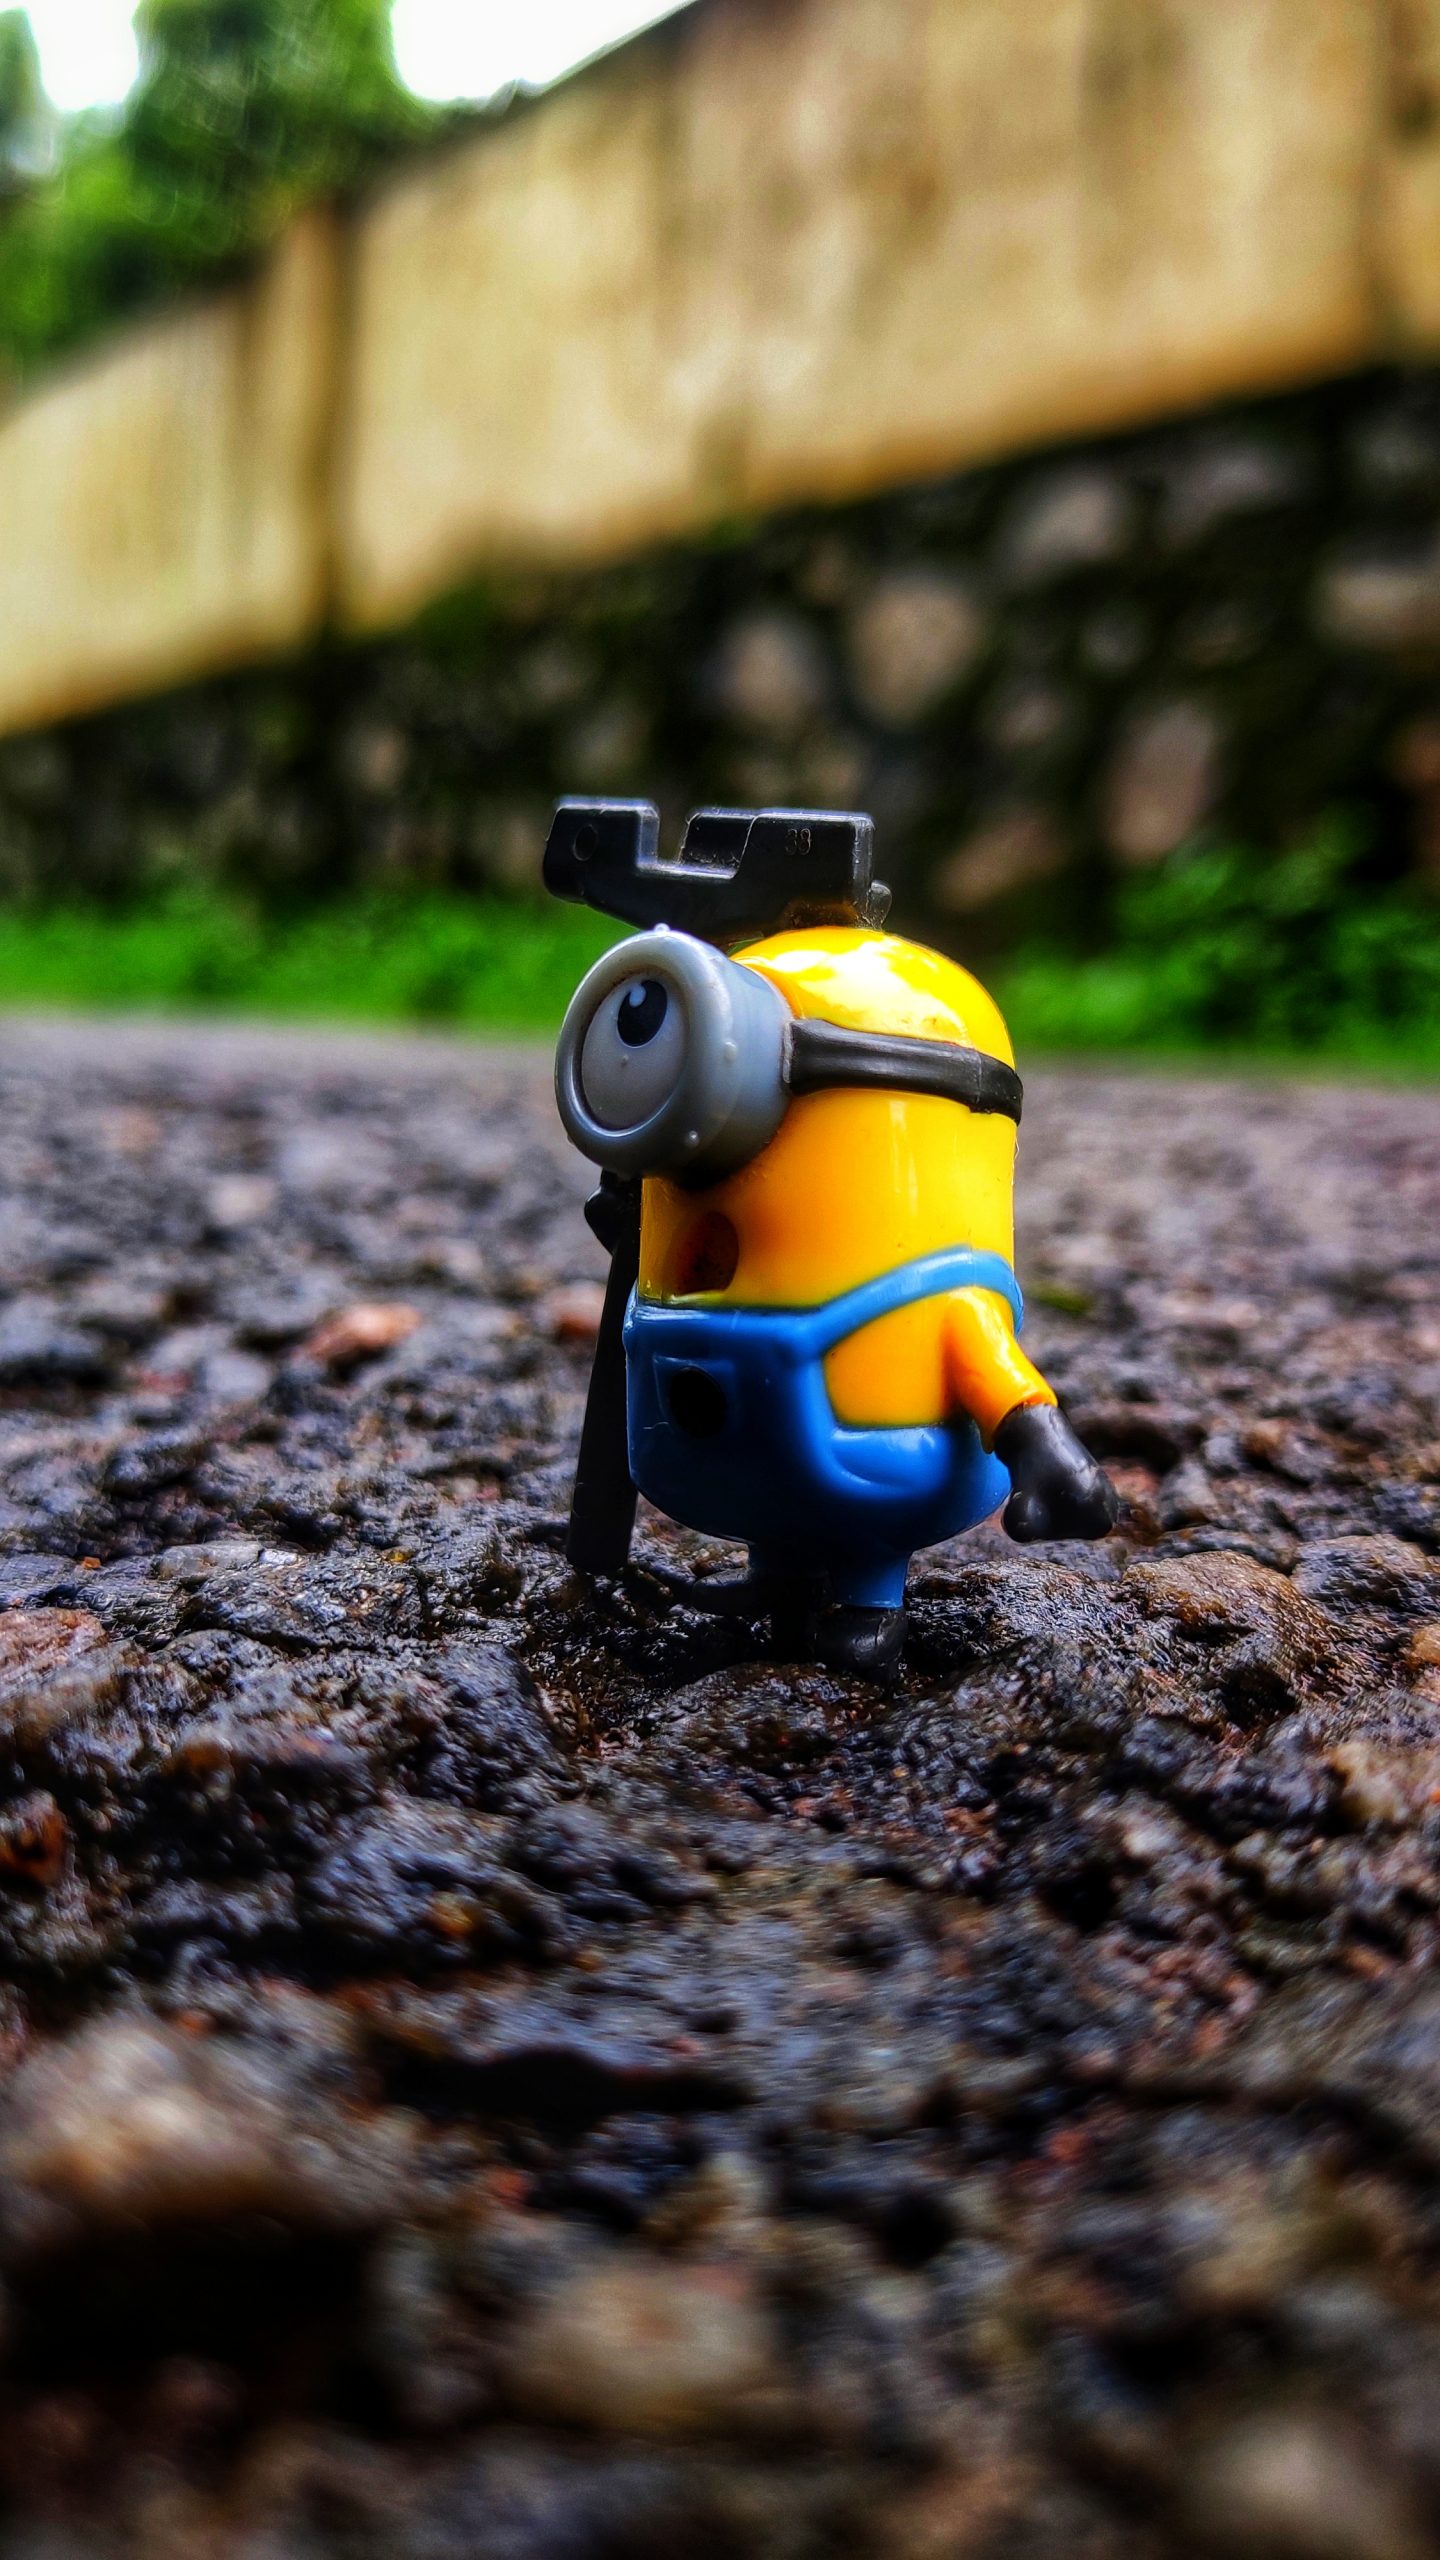 minion toy on the ground